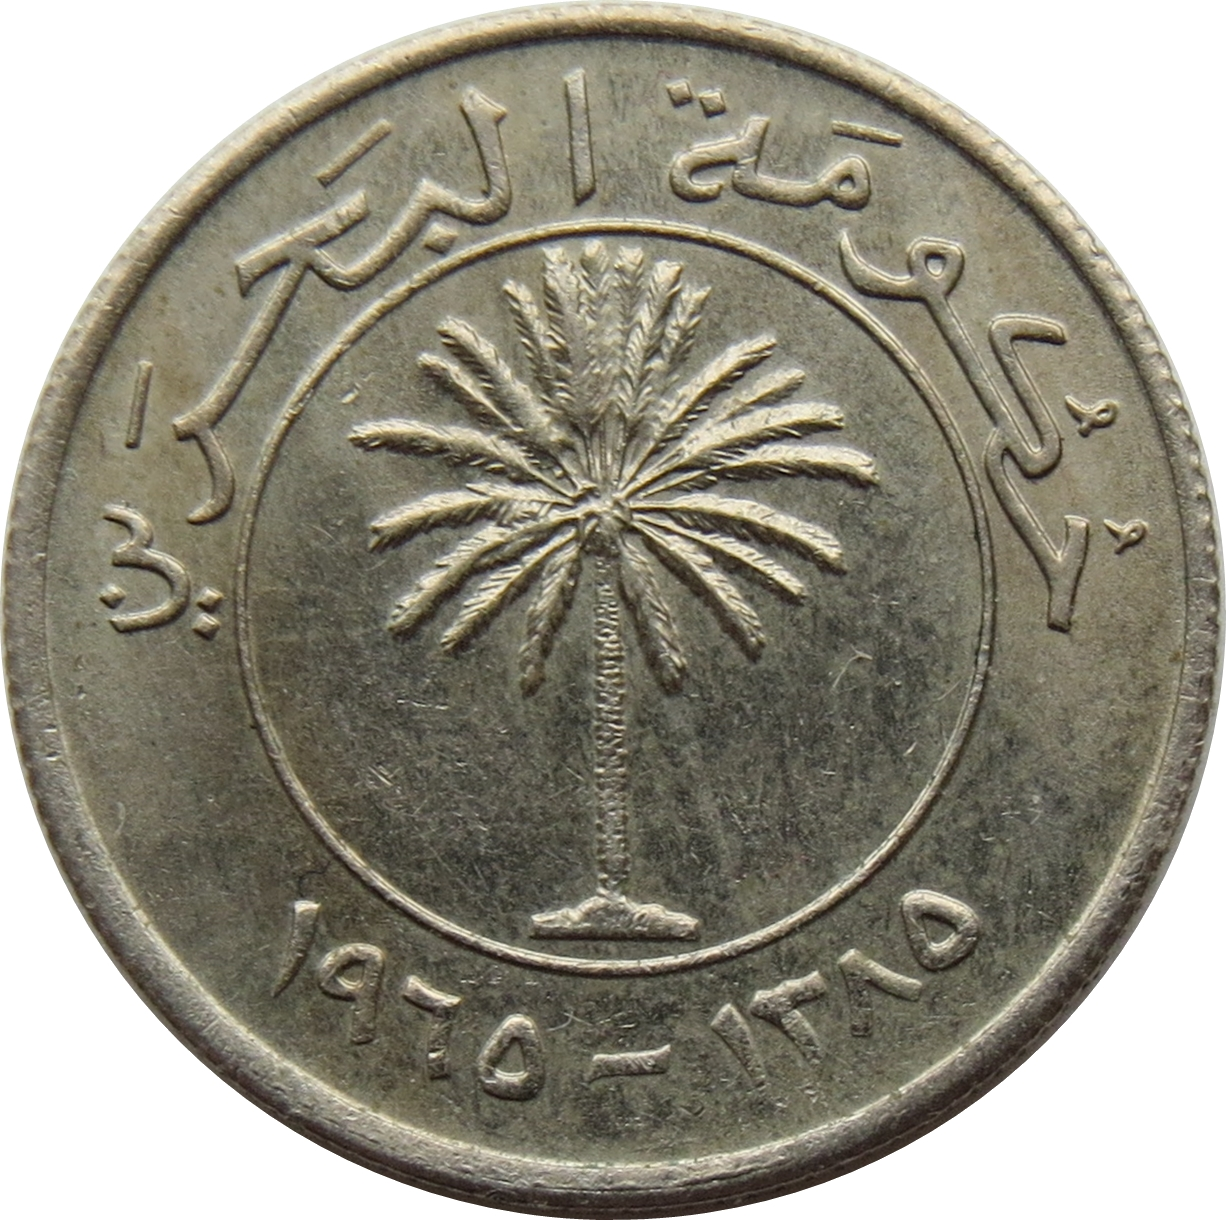 5-100 FILS 1965 Bahrain 5 coins set